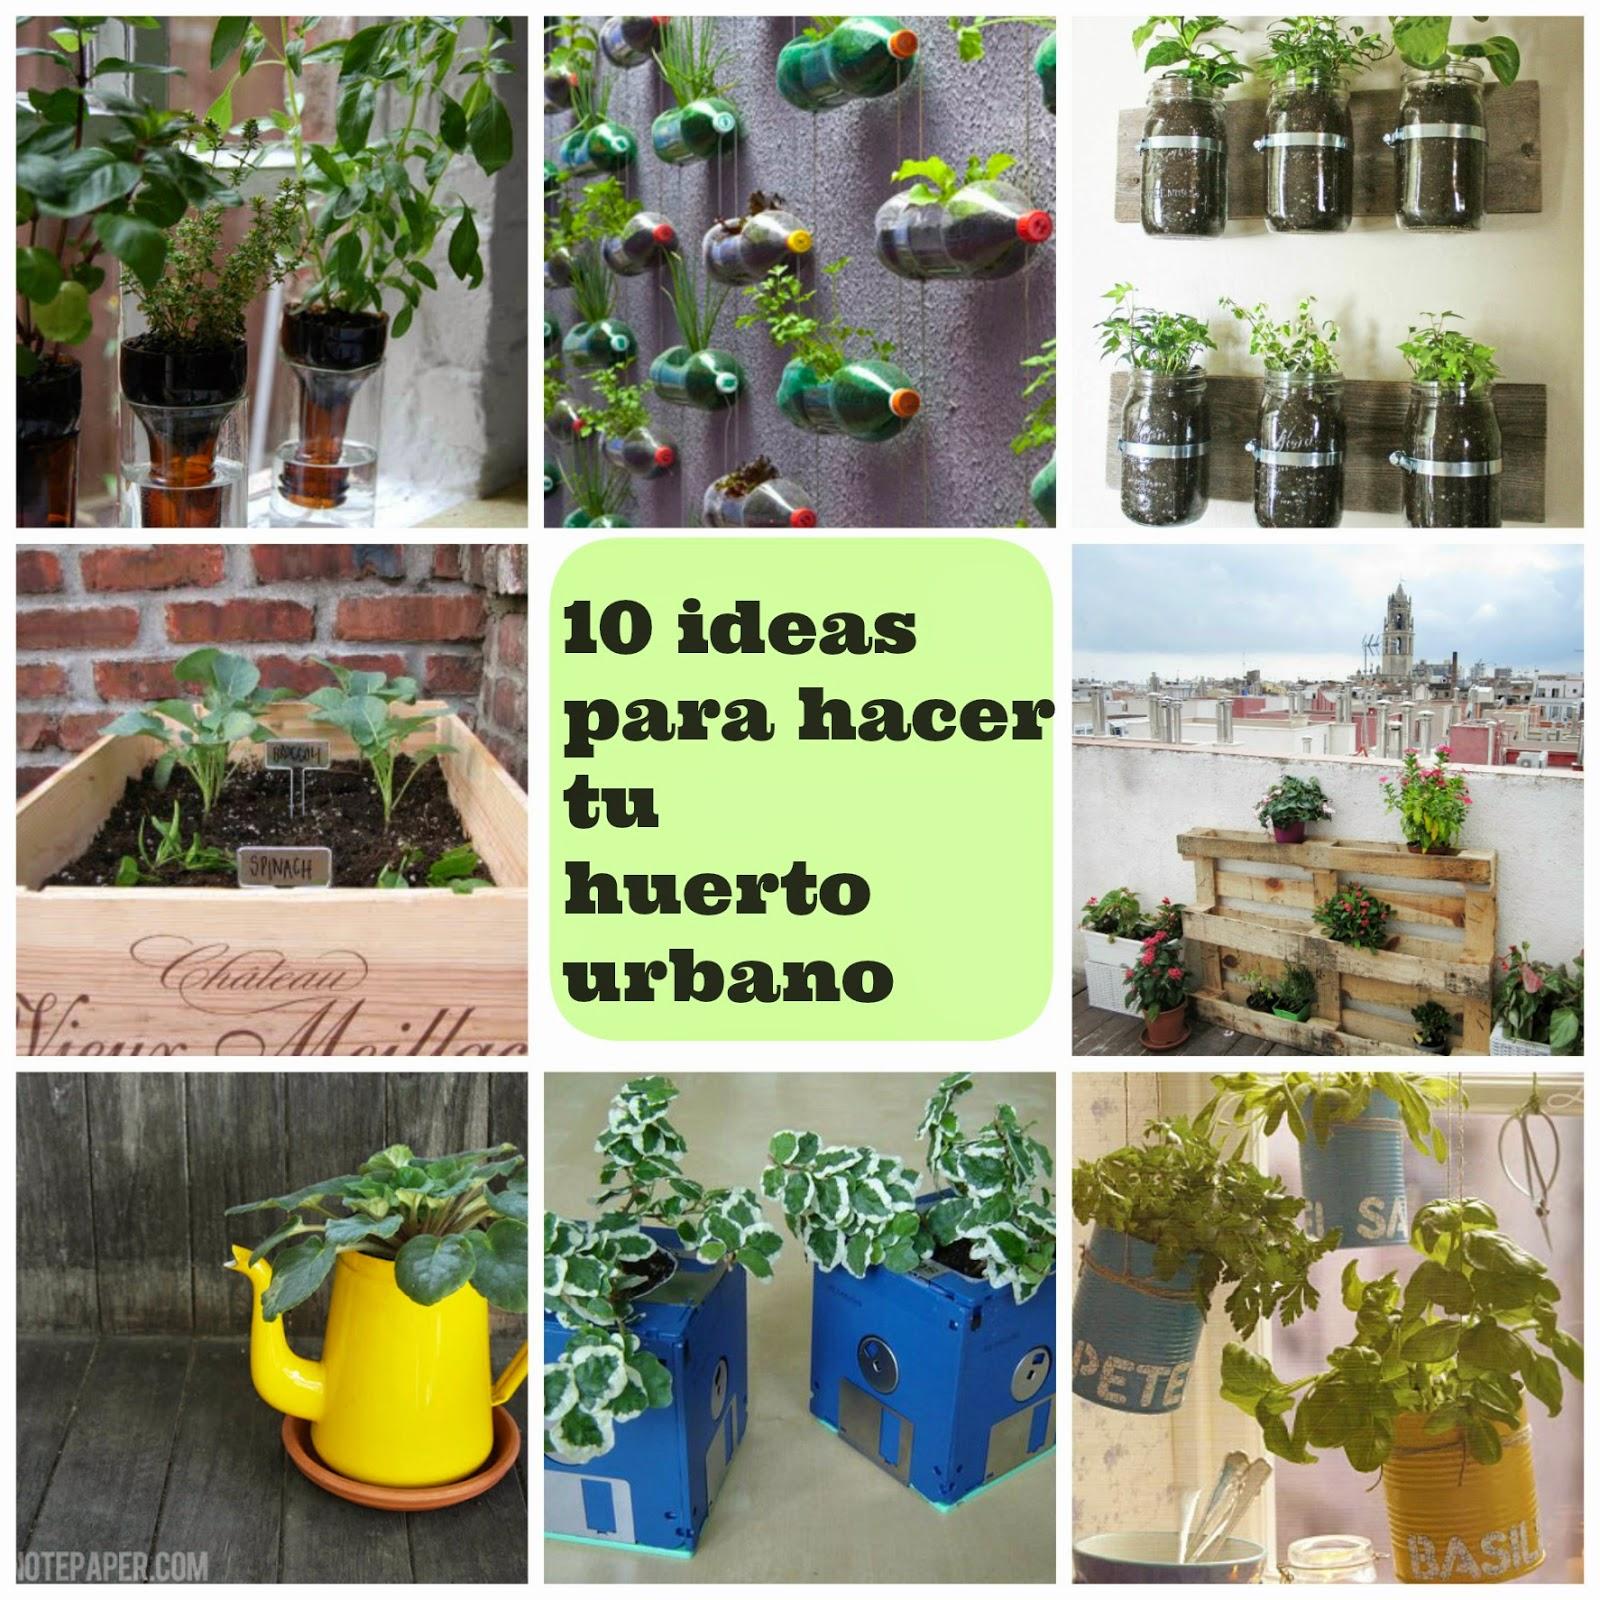 10 ideas para hacer tu huerto urbano manzanaterapia - Huerto en casa ikea ...